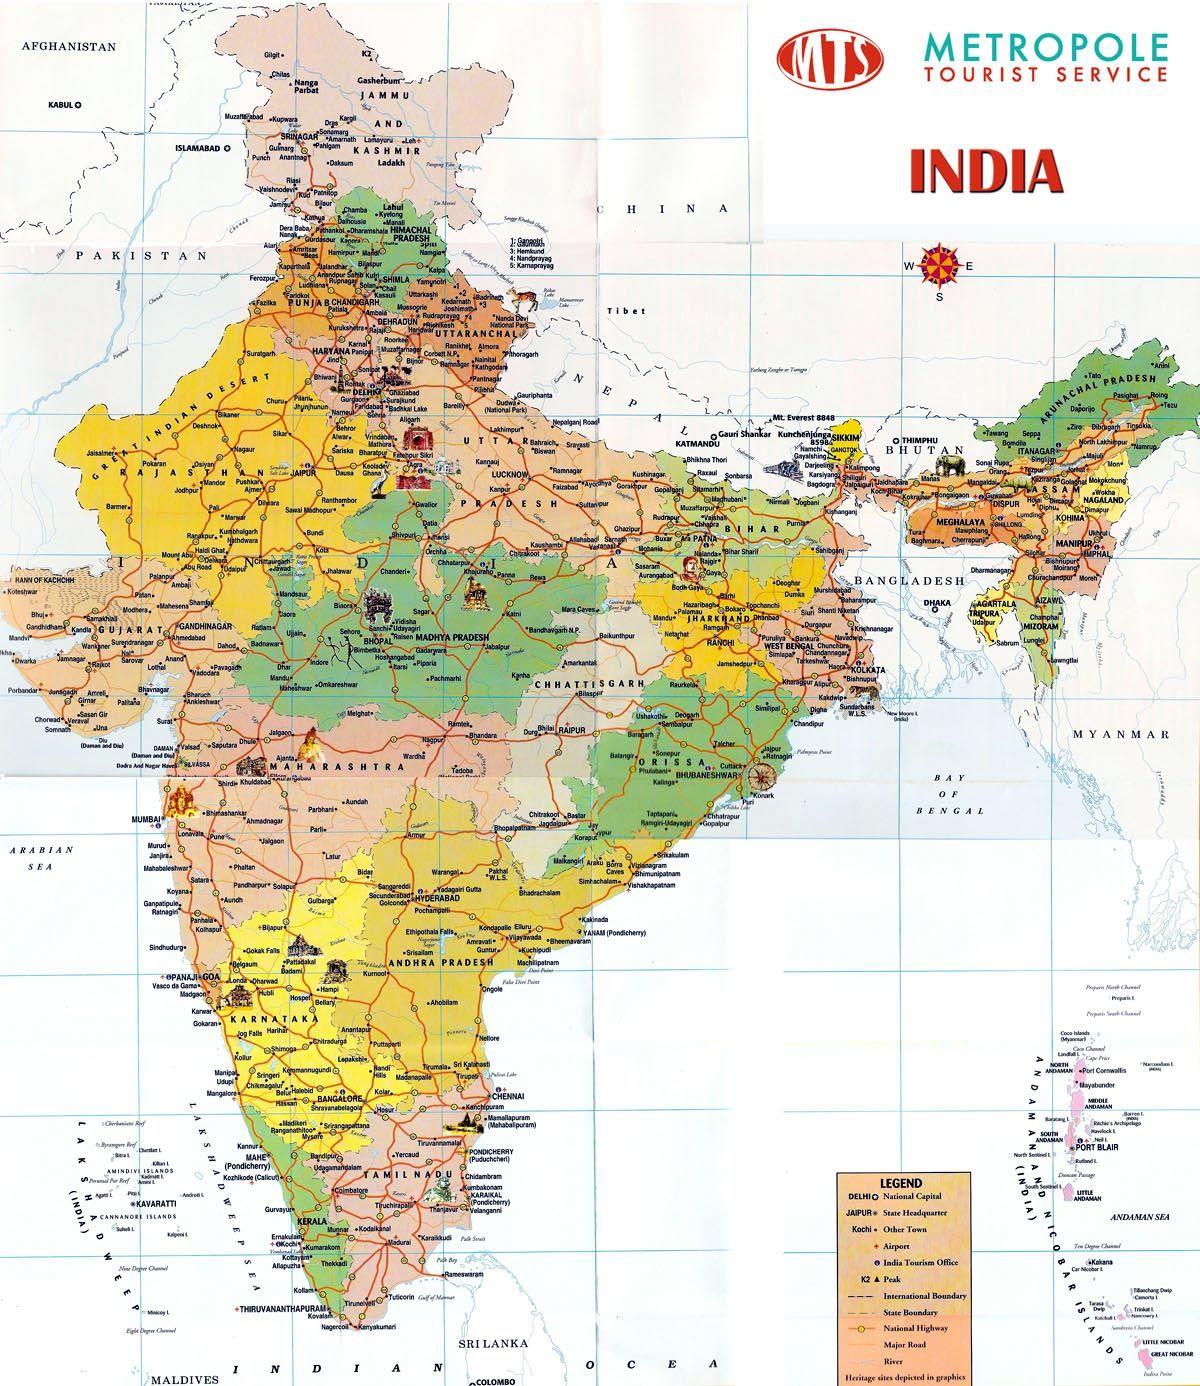 Map India India tourist, Tourist map, India map